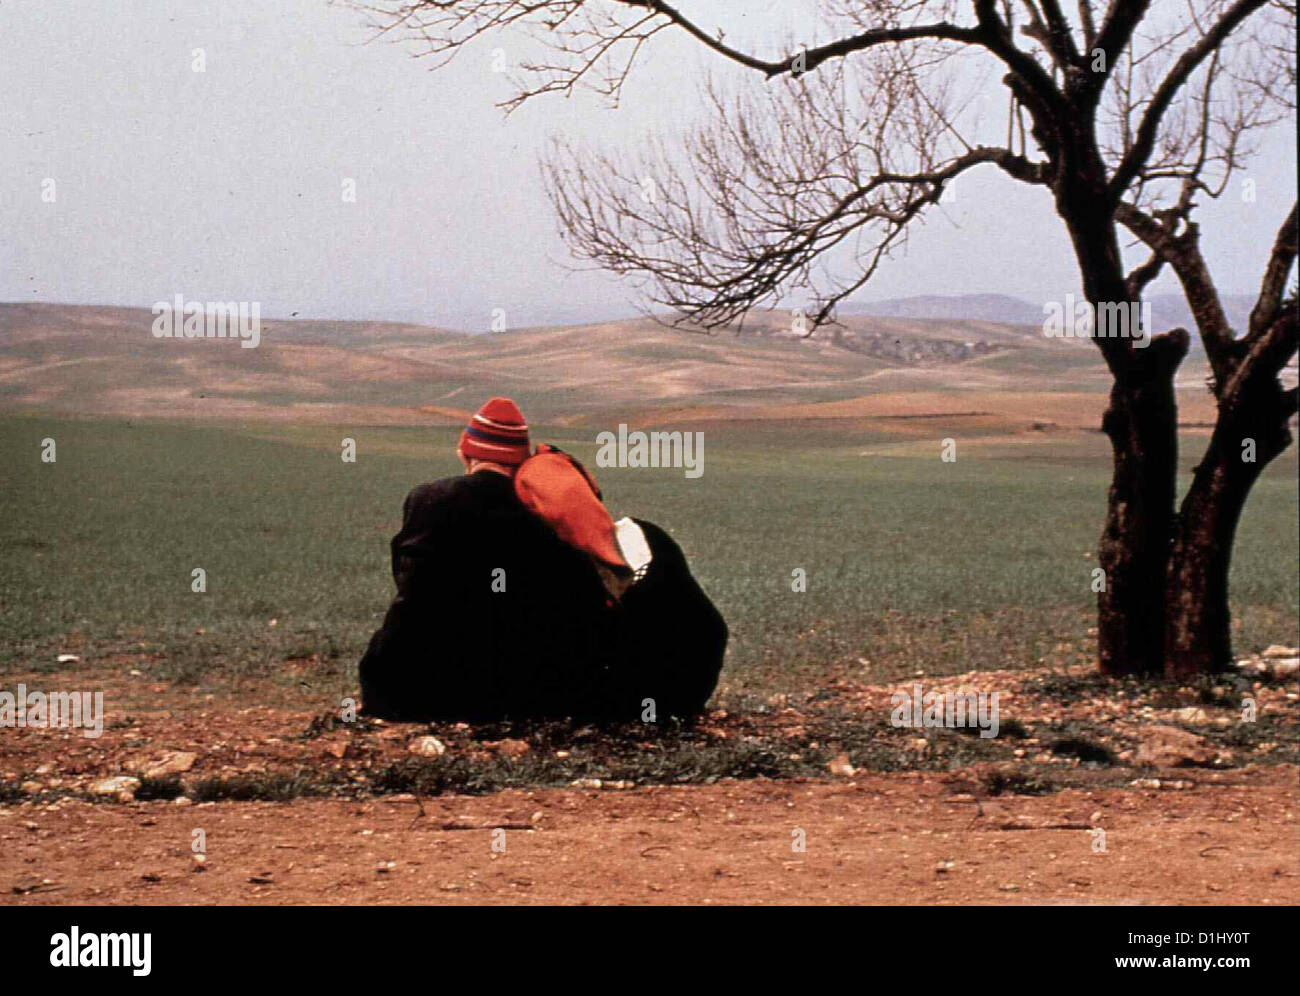 Oktober In Algier   Automne Octobre A Alger   Szene *** Local Caption *** 1992  -- - Stock Image